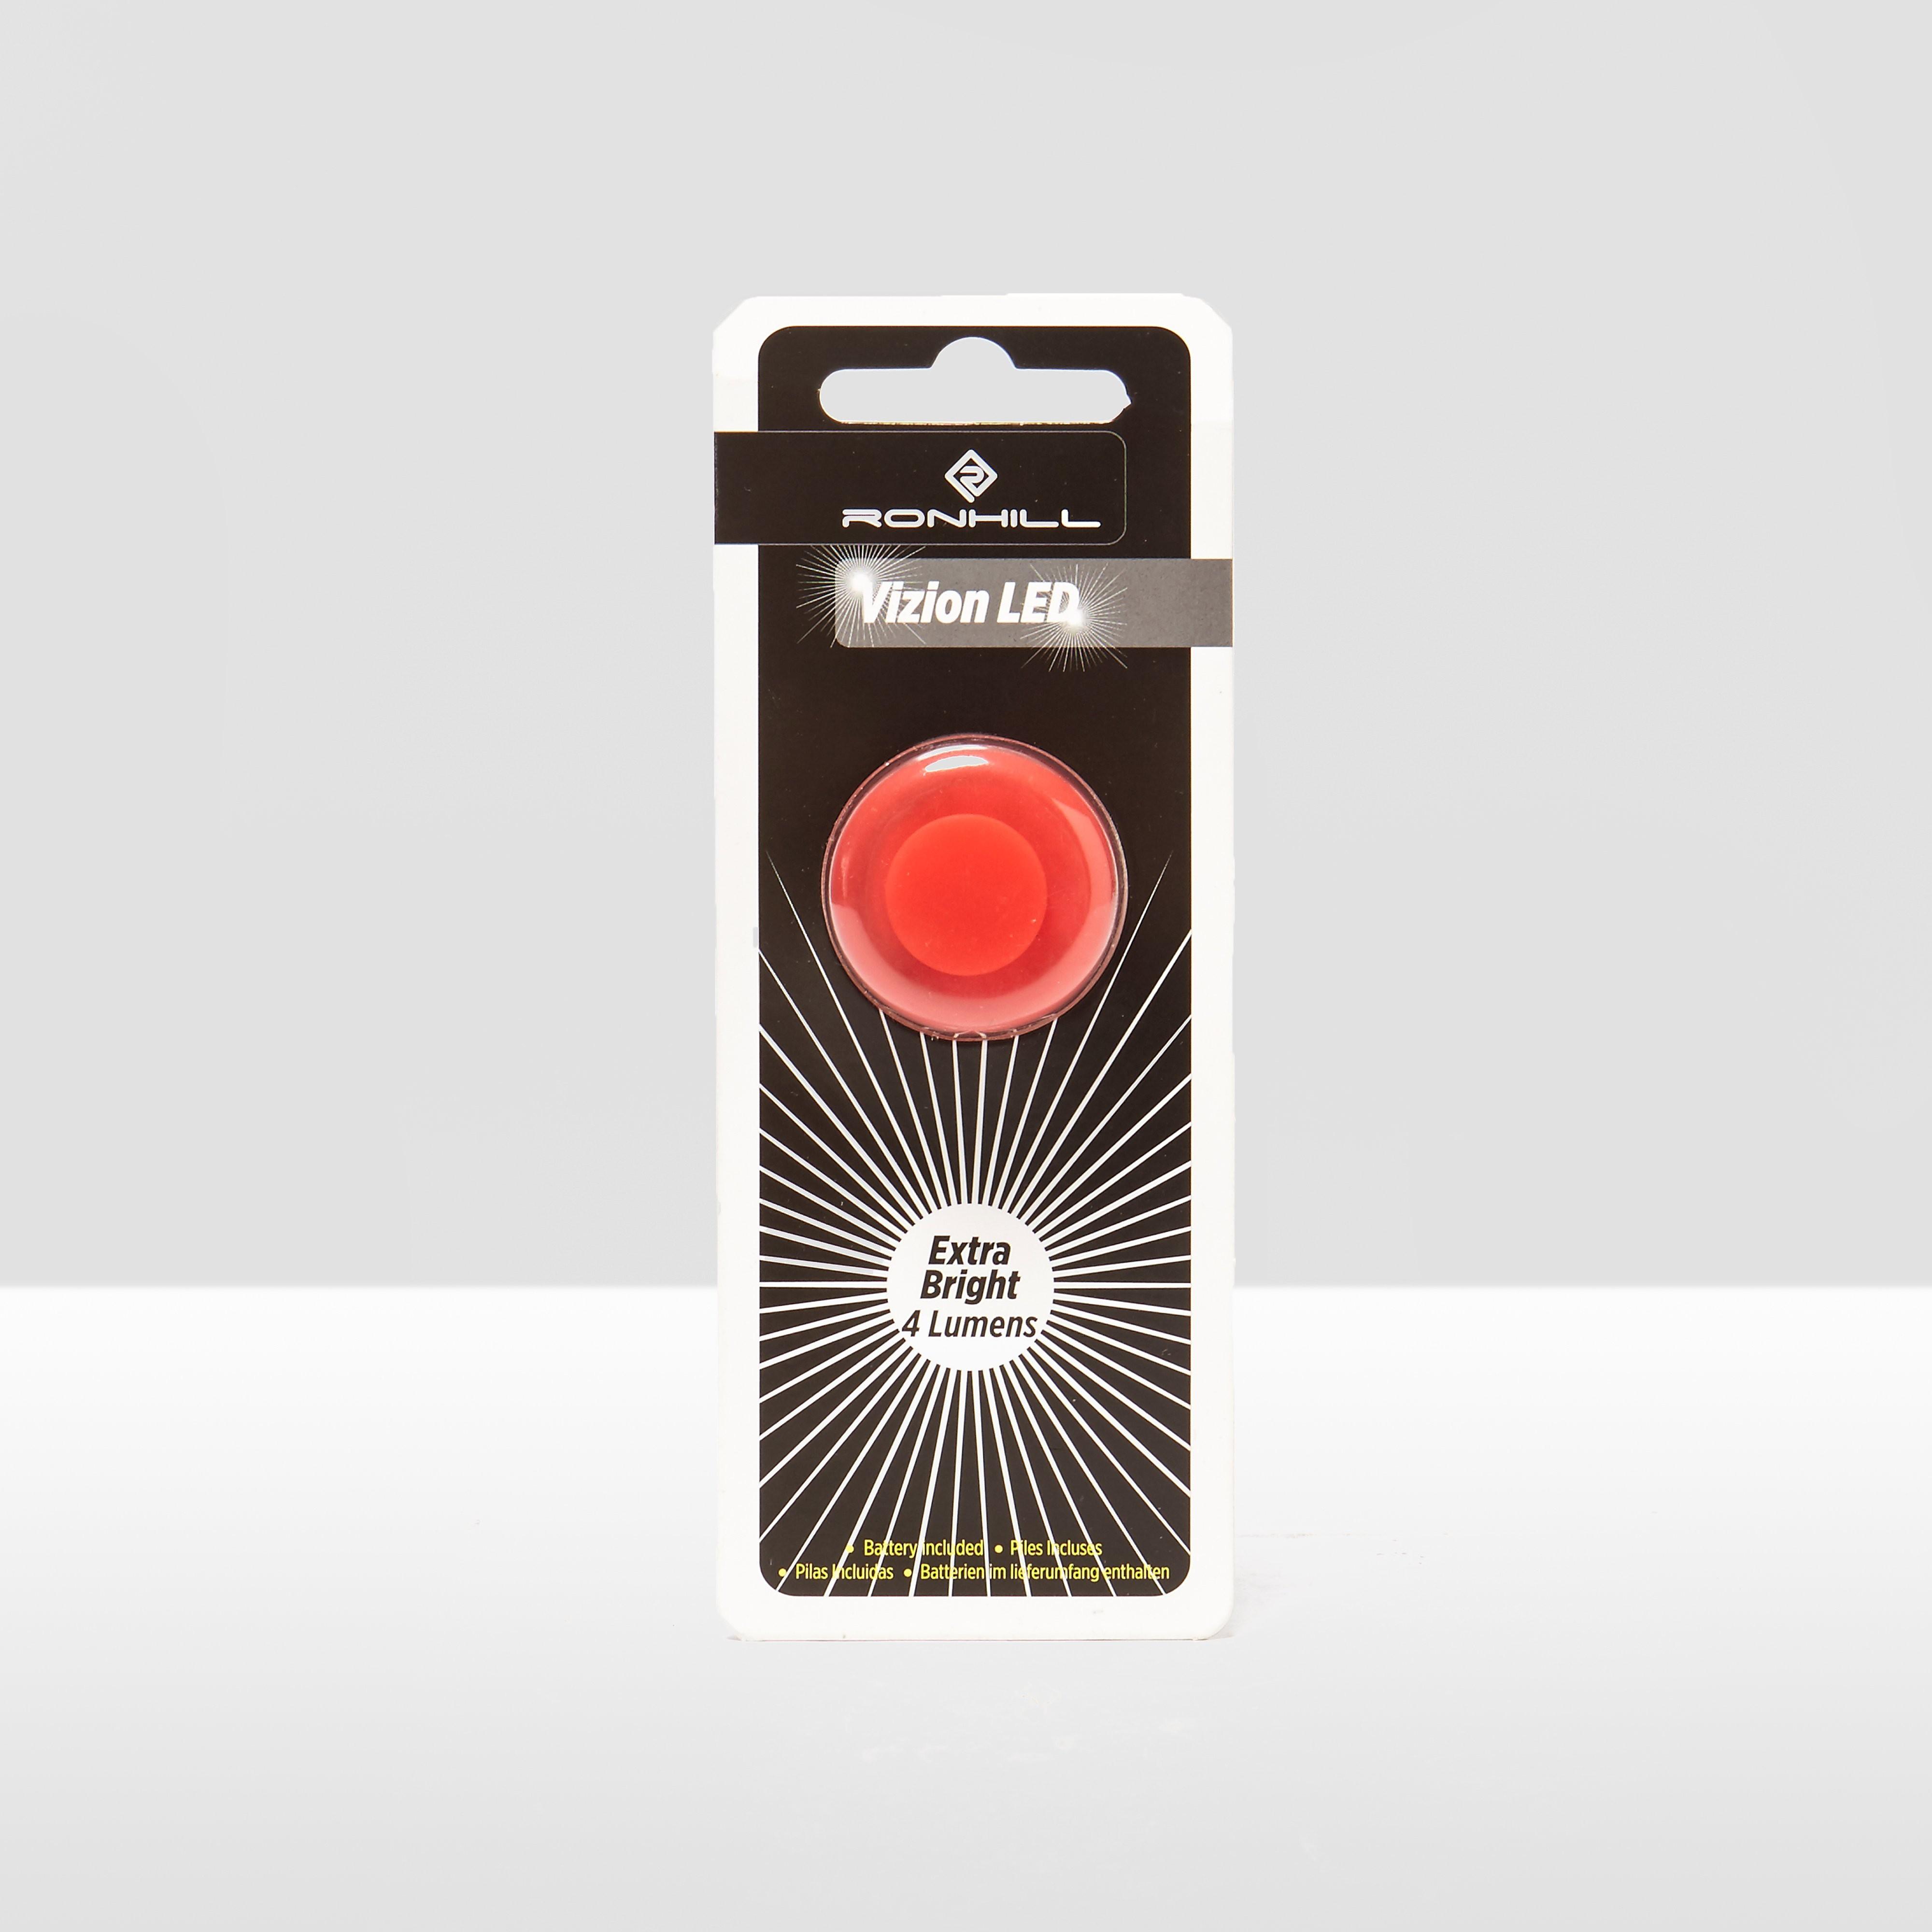 Ronhill Vizion LED running light